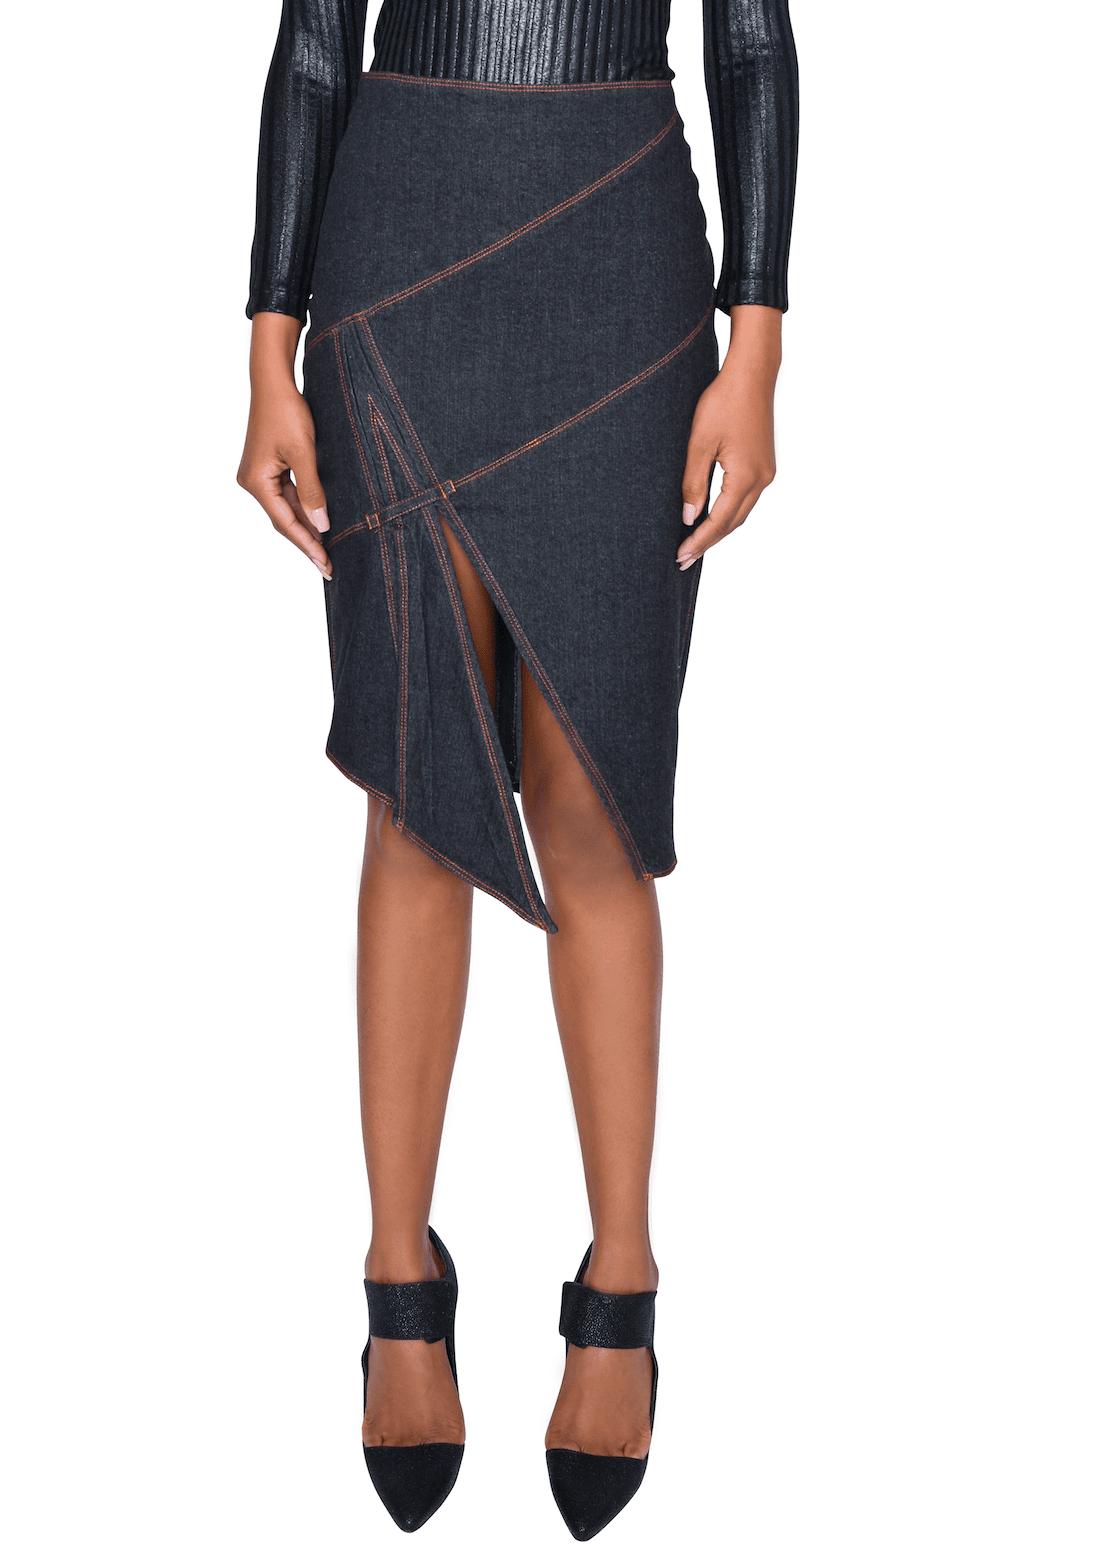 Skirt ALFIRK 1